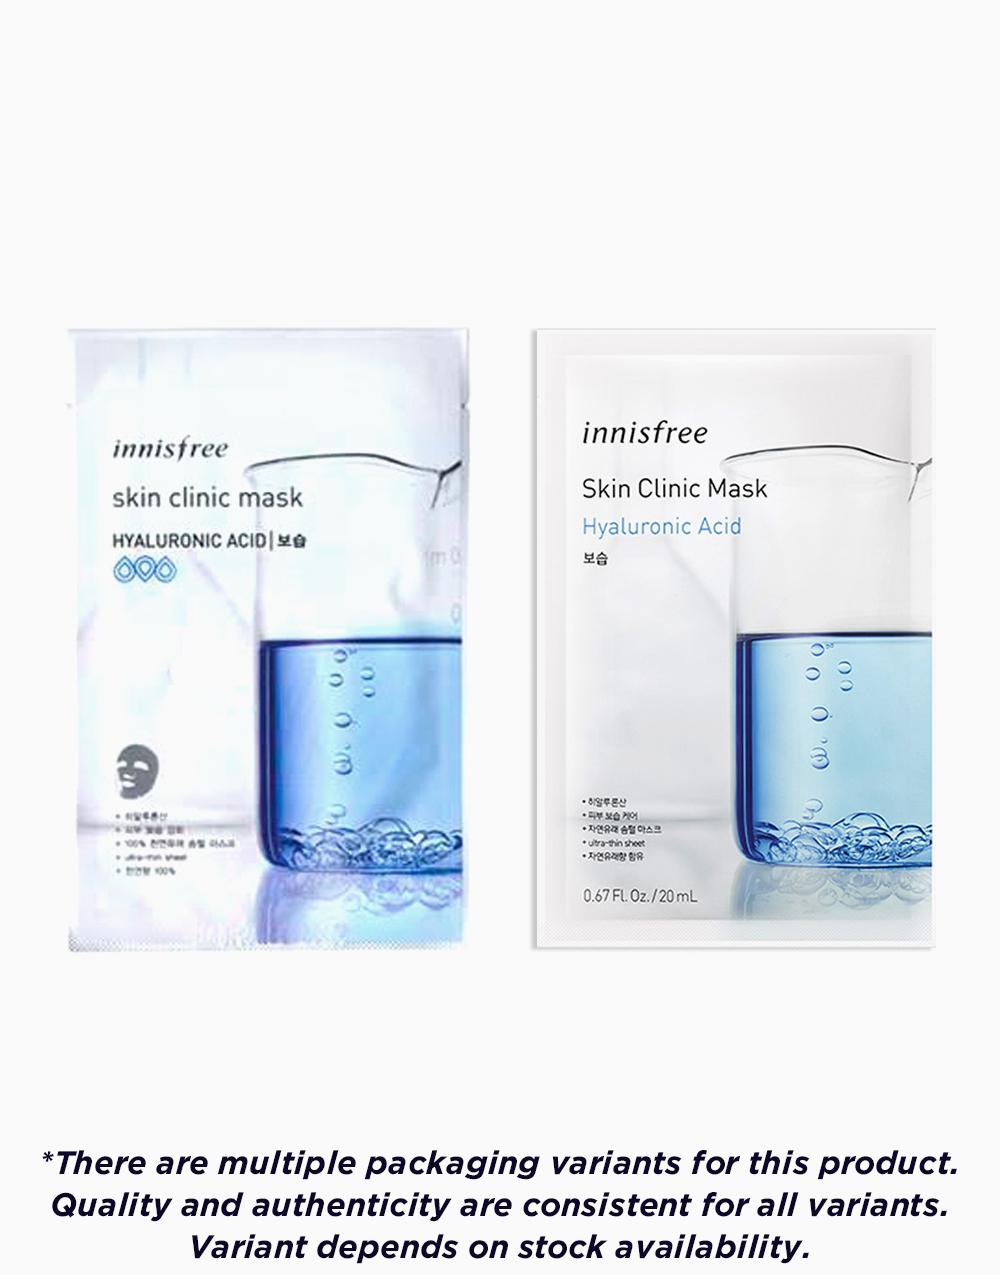 Skin Clinic Mask: Hyaluronic Acid by Innisfree